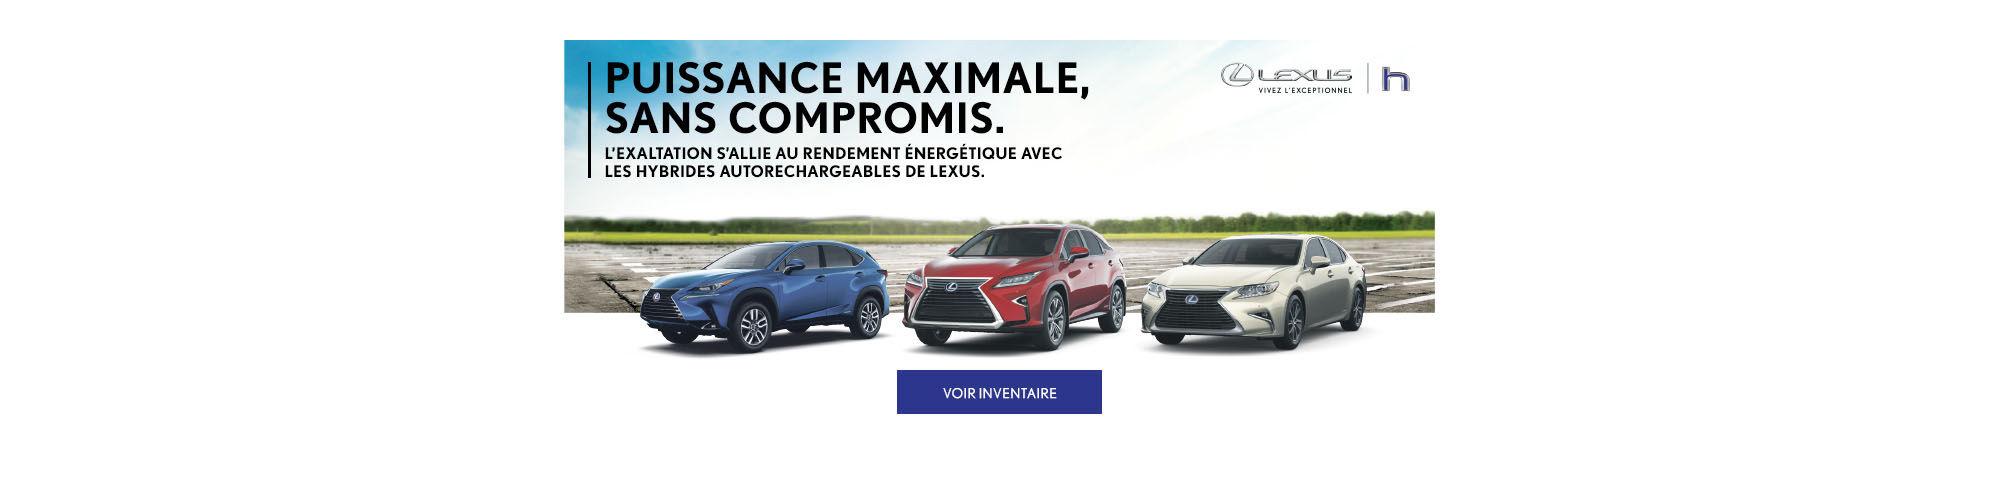 Lexus hybrides